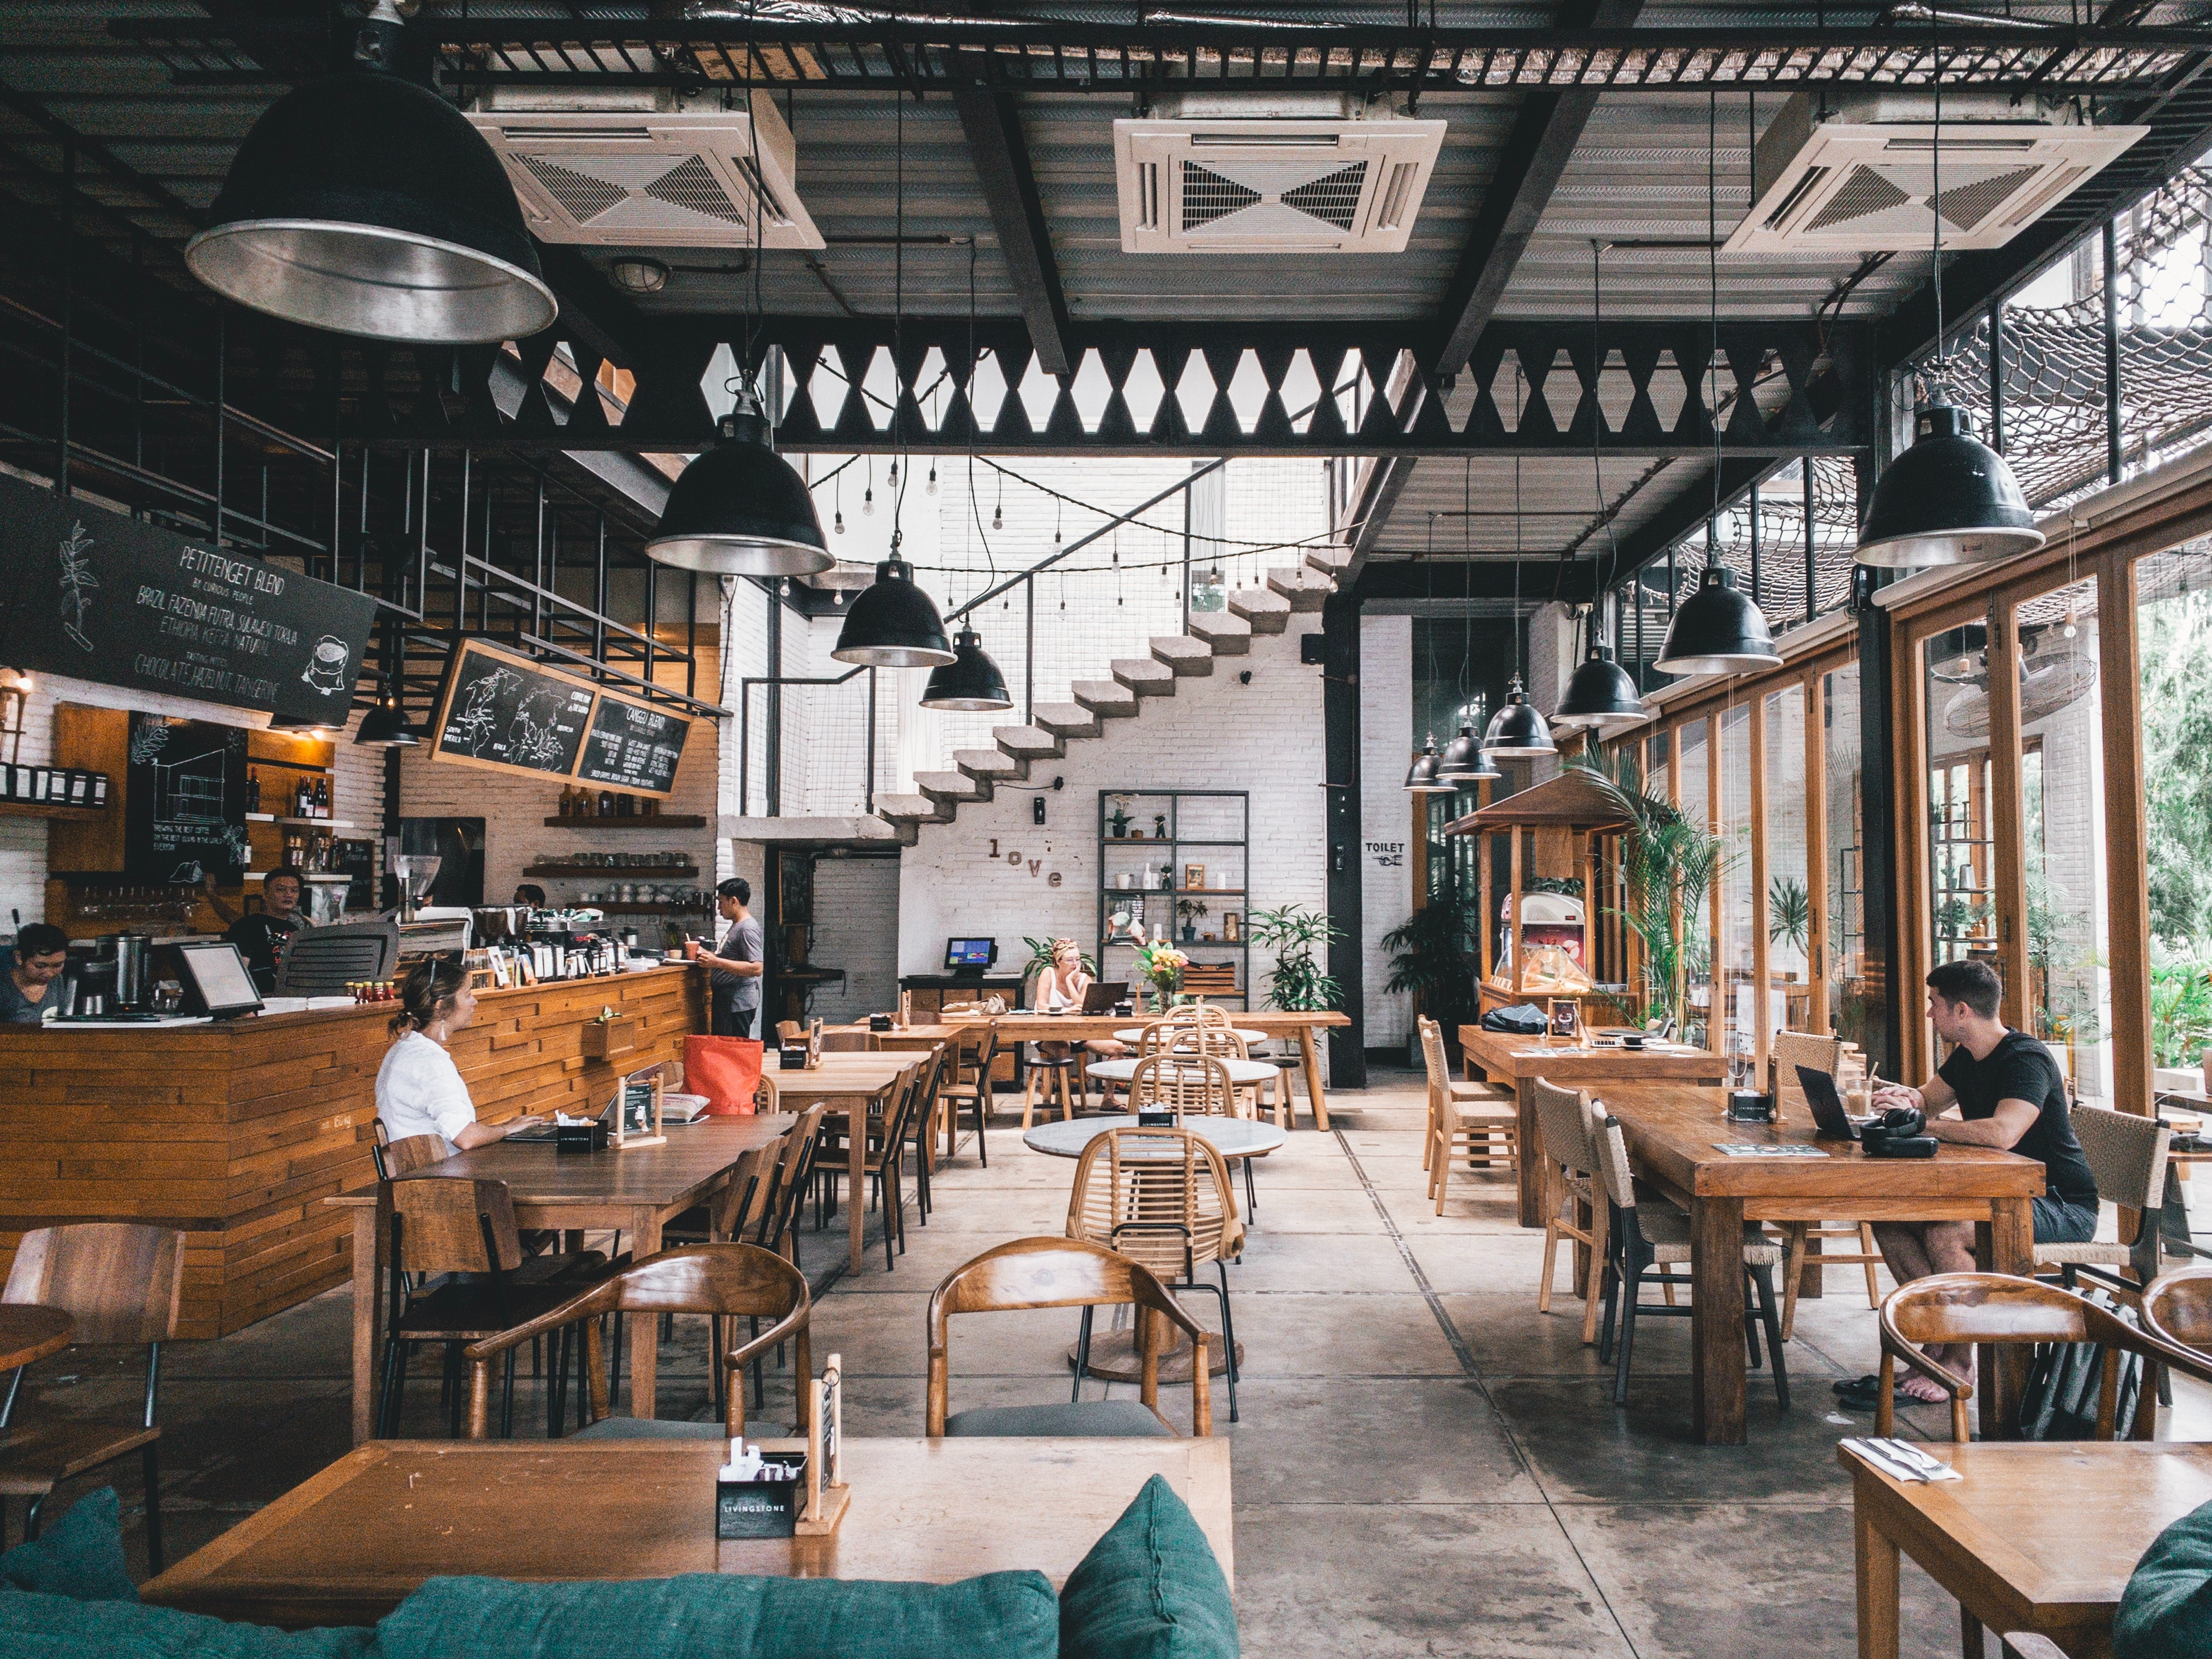 2021 Trends in Restaurant Technology